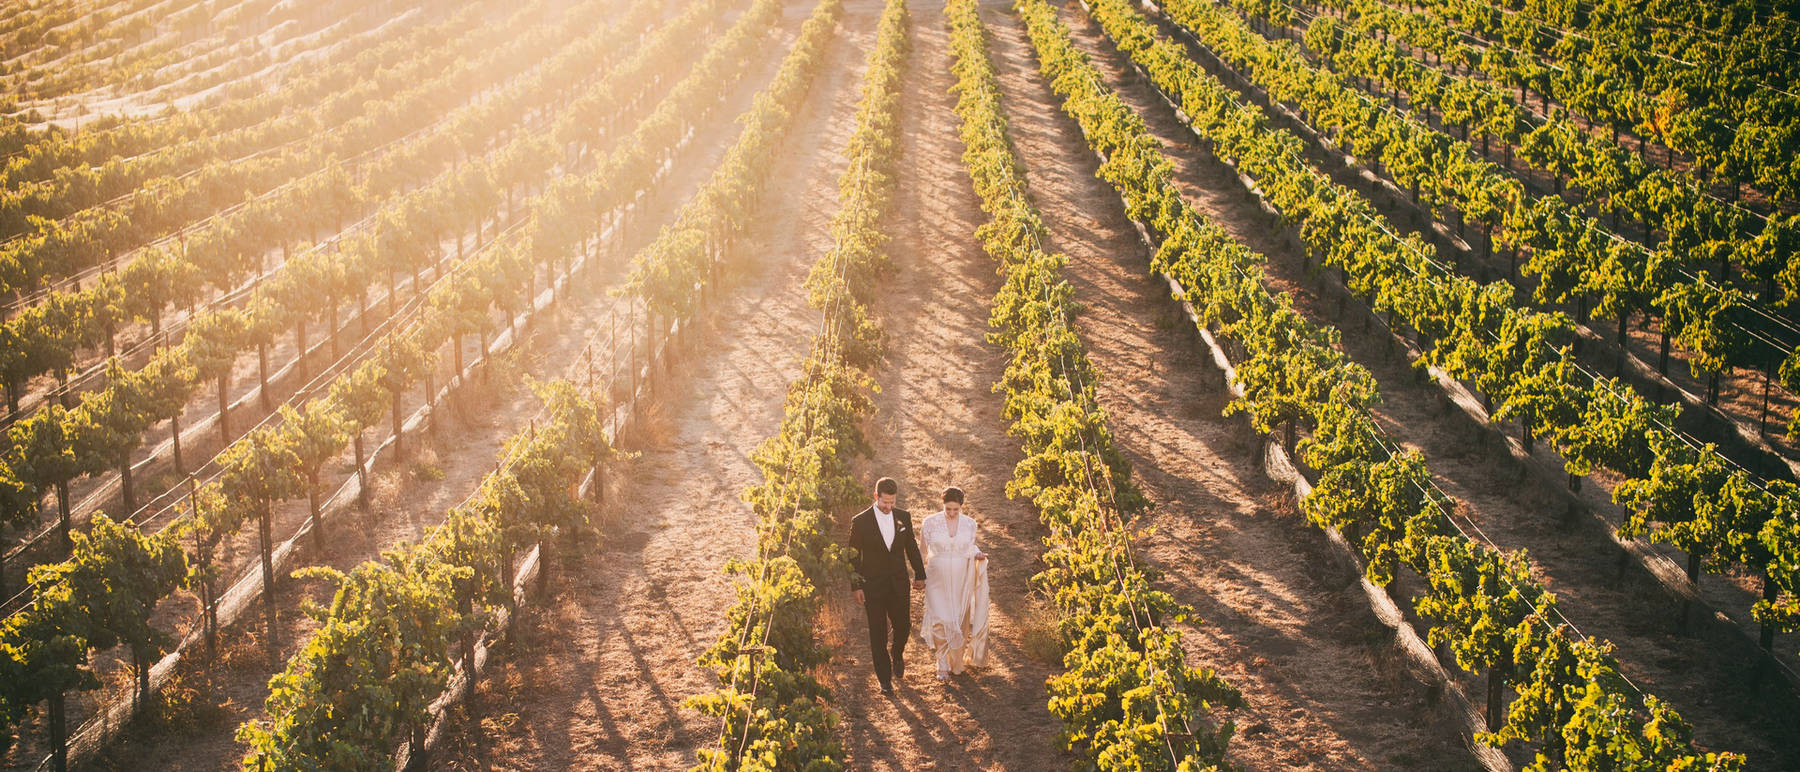 johnandjoseph-wedding-photographer-hz-slider-181